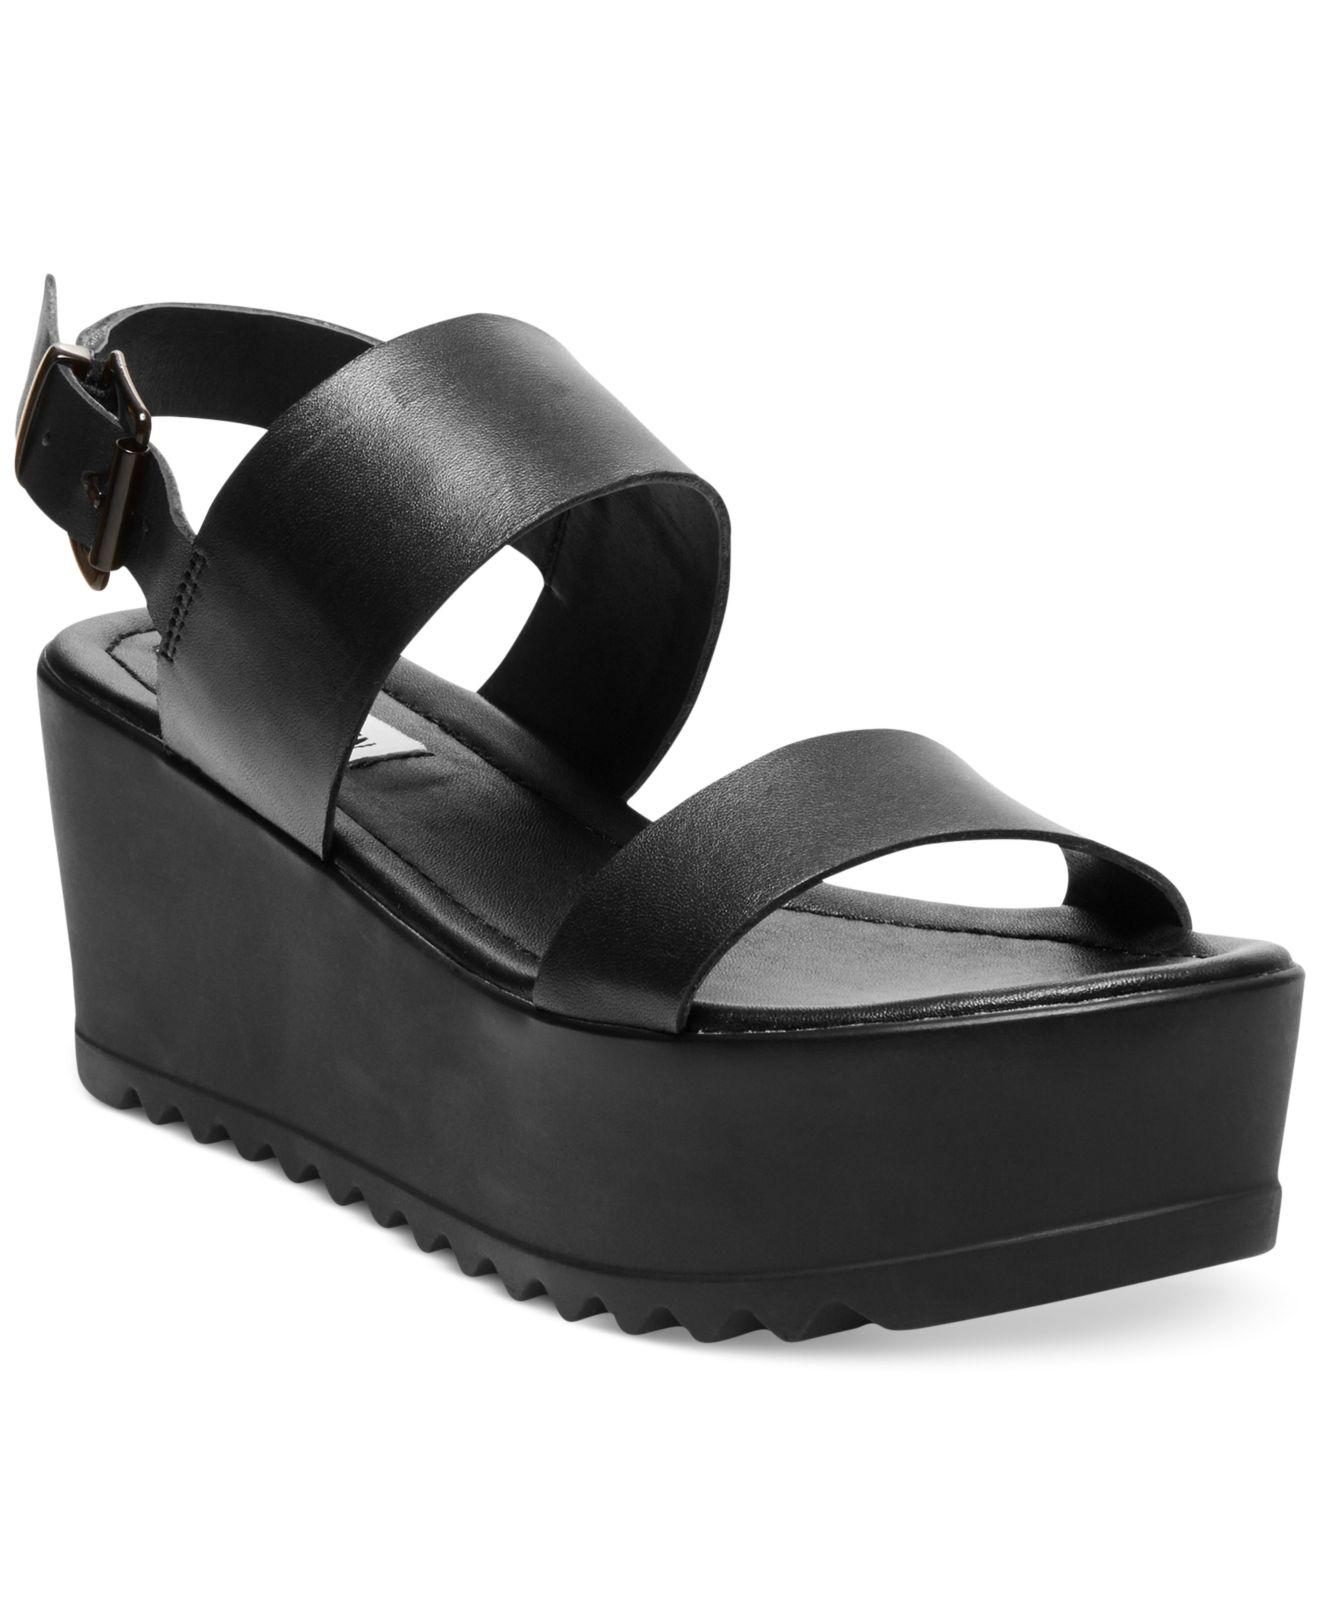 7d7939893a05 Lyst - Steve Madden Women S Wave Two-Piece Platform Wedge Sandals in ...